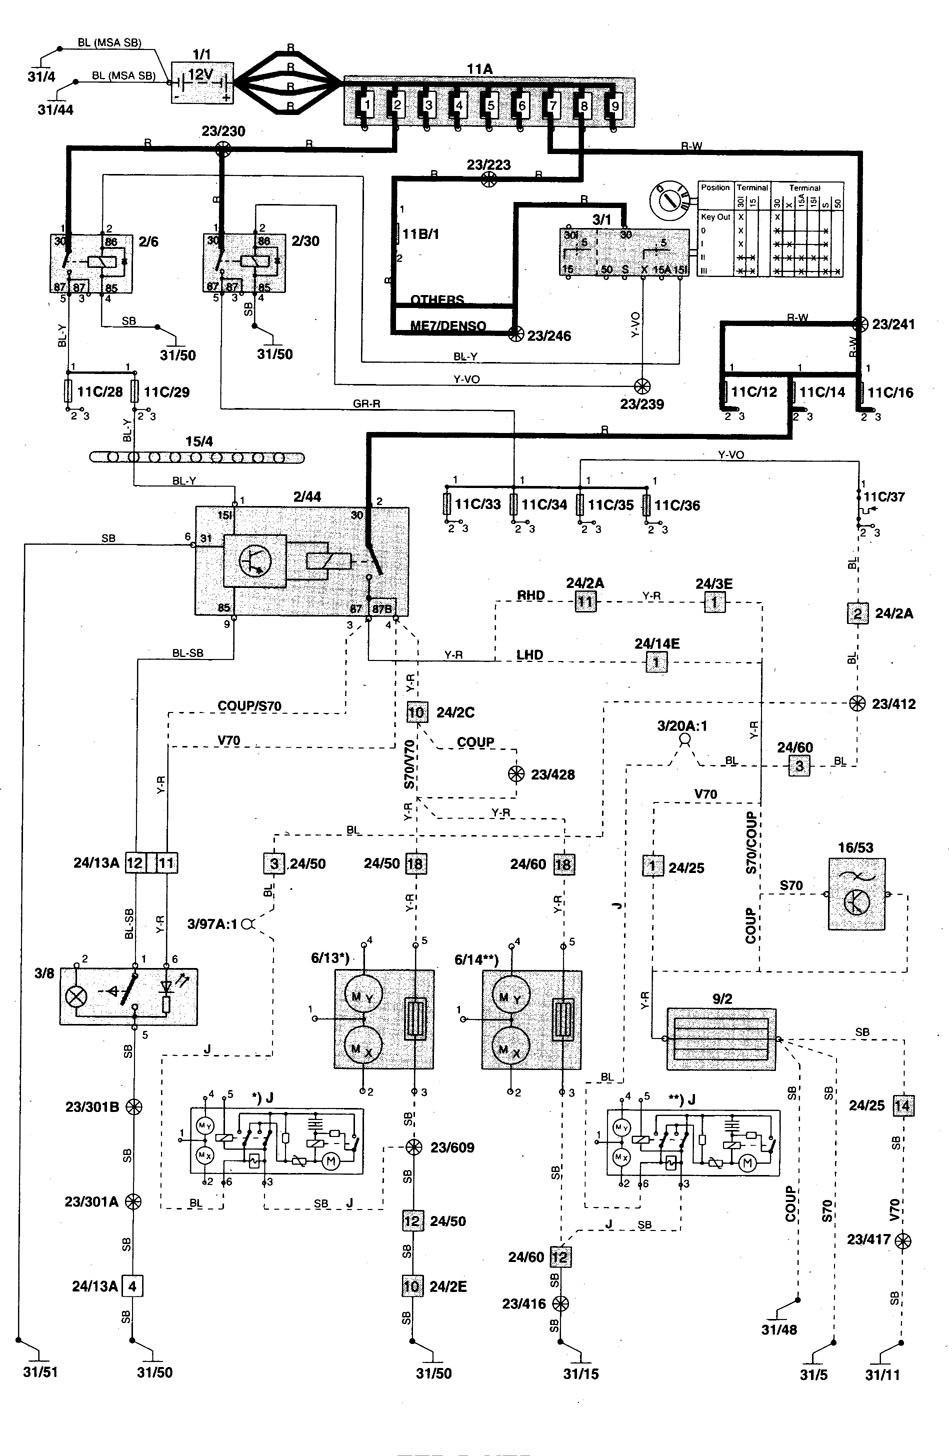 1998 Volvo V70 Wiring | discus-pattern Wiring Diagram union -  discus-pattern.buildingblocks2016.eu | Volvo S60 Window Wiring Diagram |  | buildingblocks2016.eu